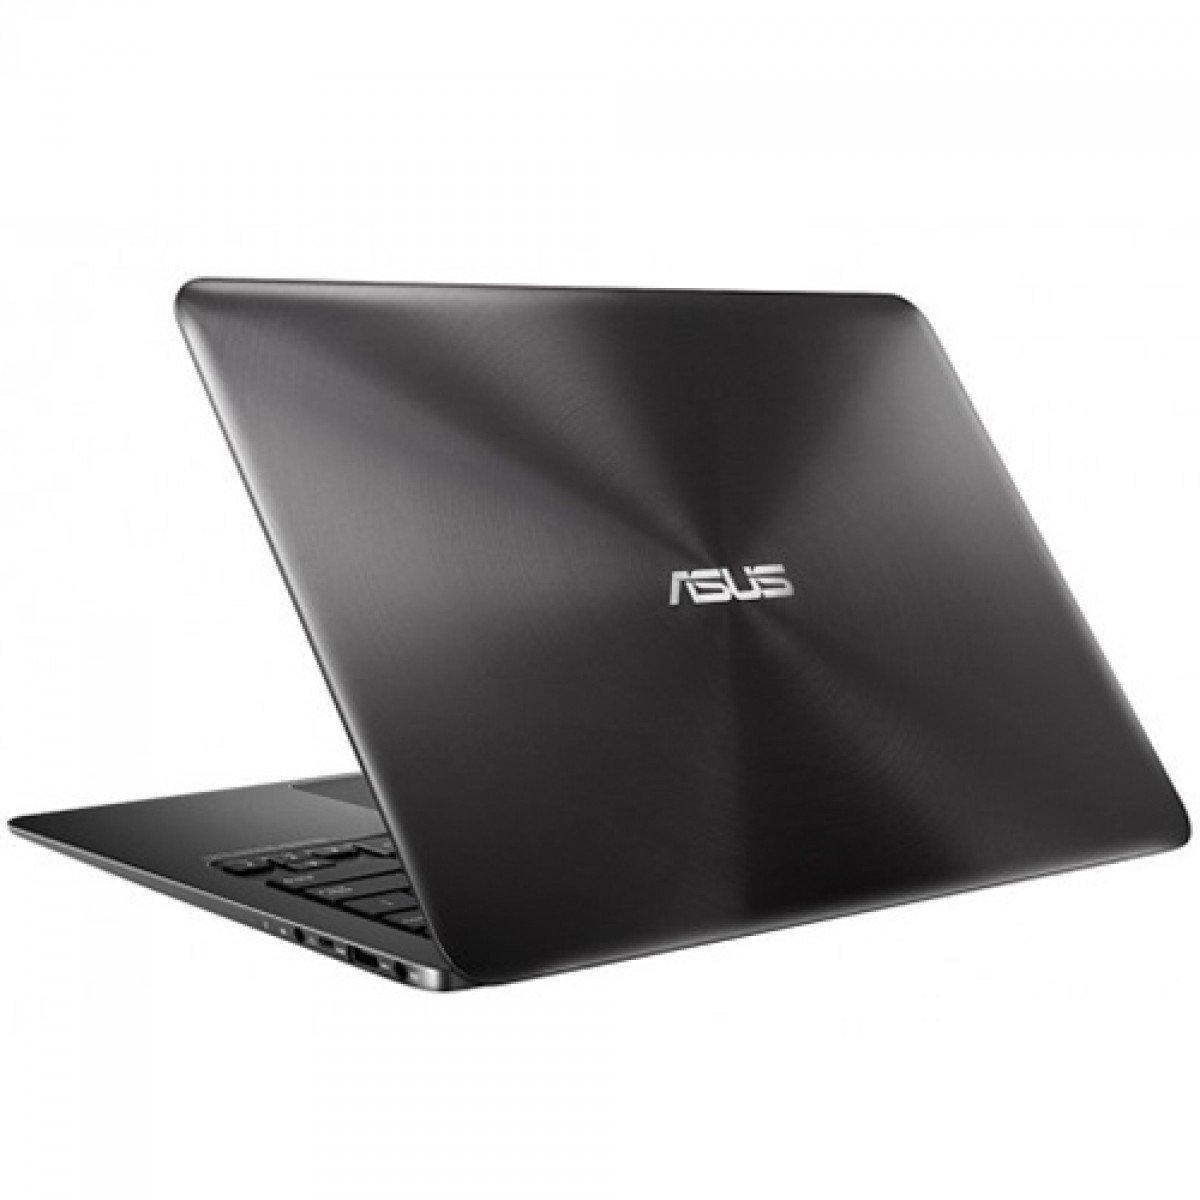 "ASUS ZenBook UX305FA 13.3"" Intel Core M-5Y10 - RAM 4GB - SSD 128GB - QWERTY"